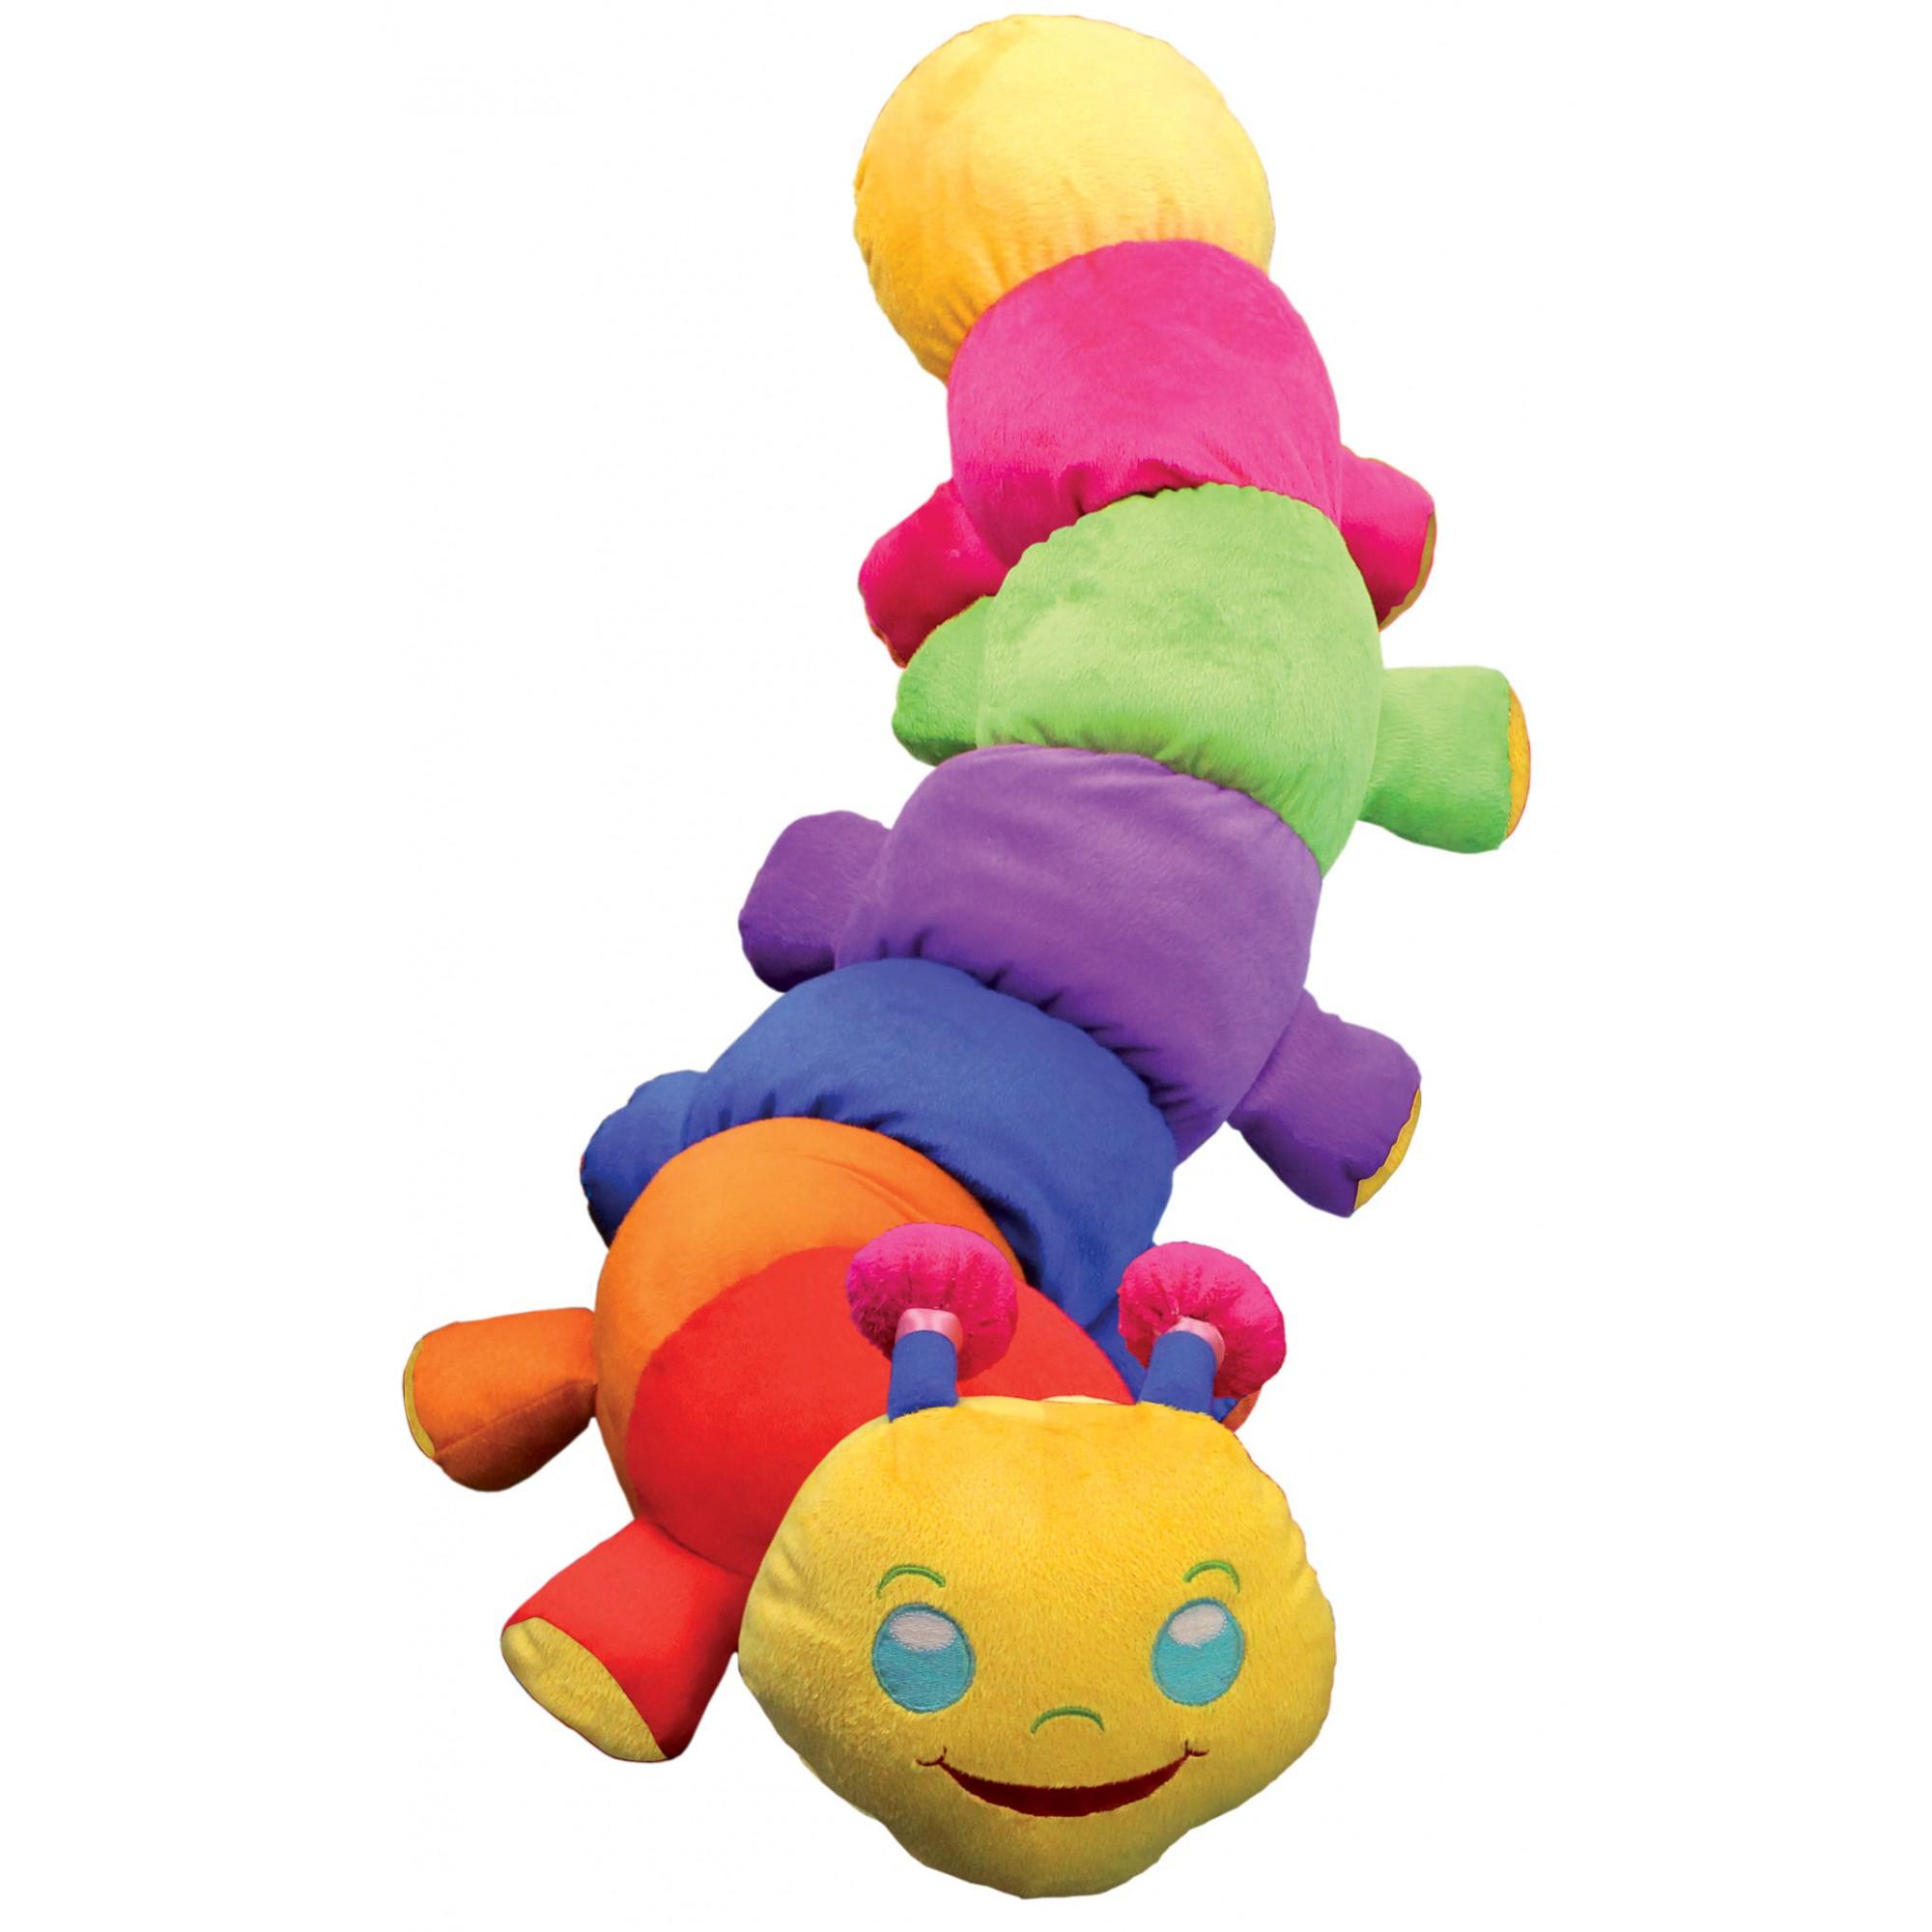 Centopeia Colorida de Pelúcia Plush Brinquedo Educativo